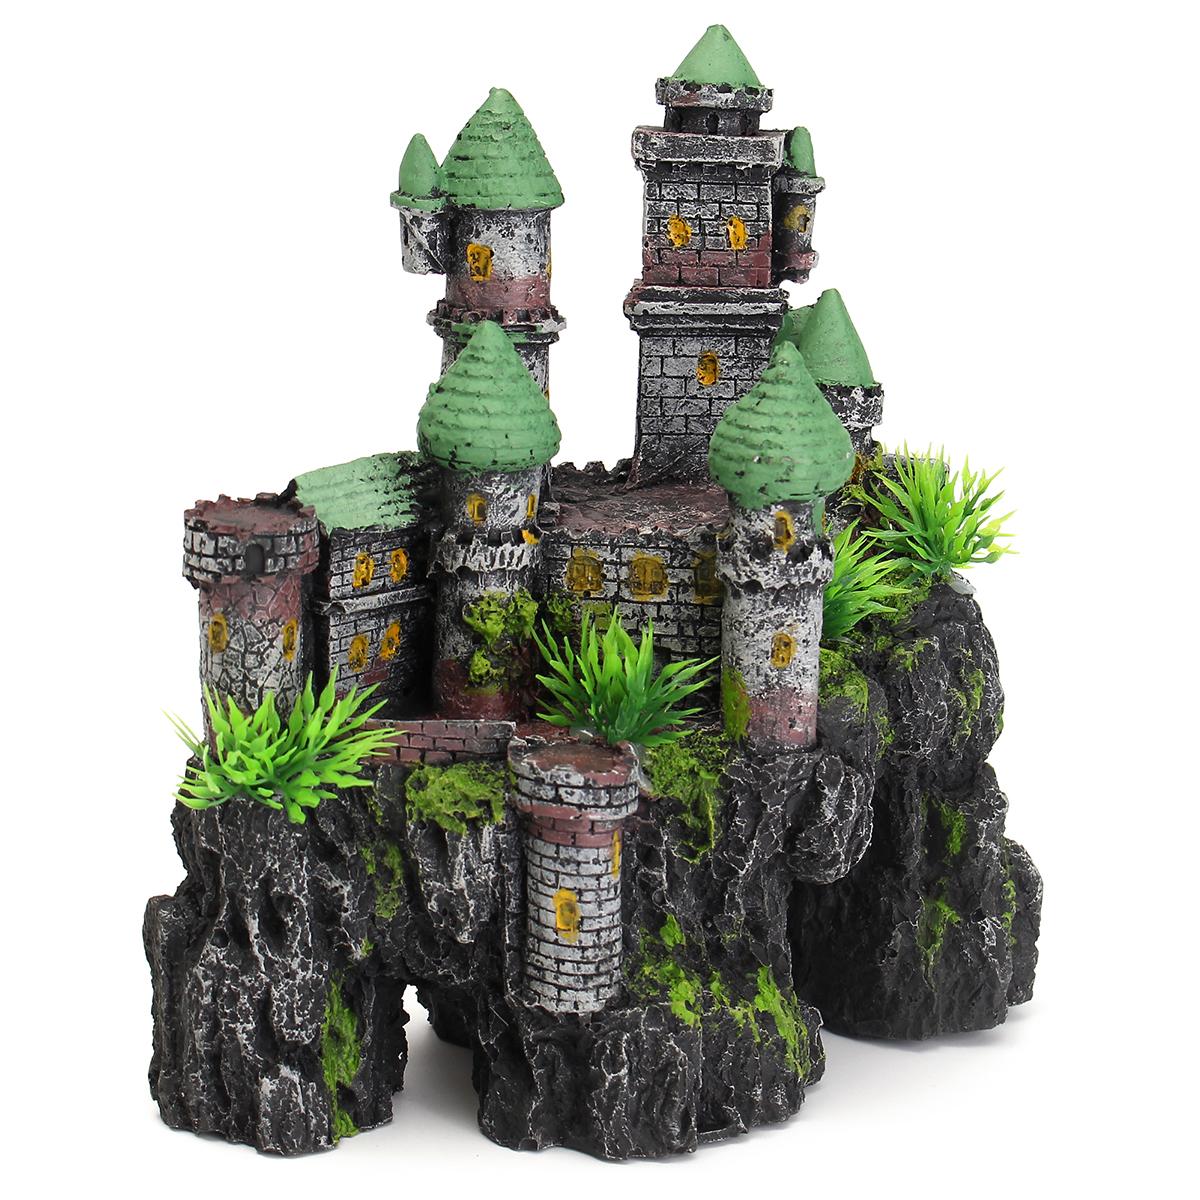 Aquarium Resin Medieval Castle Tower House Fish Tank